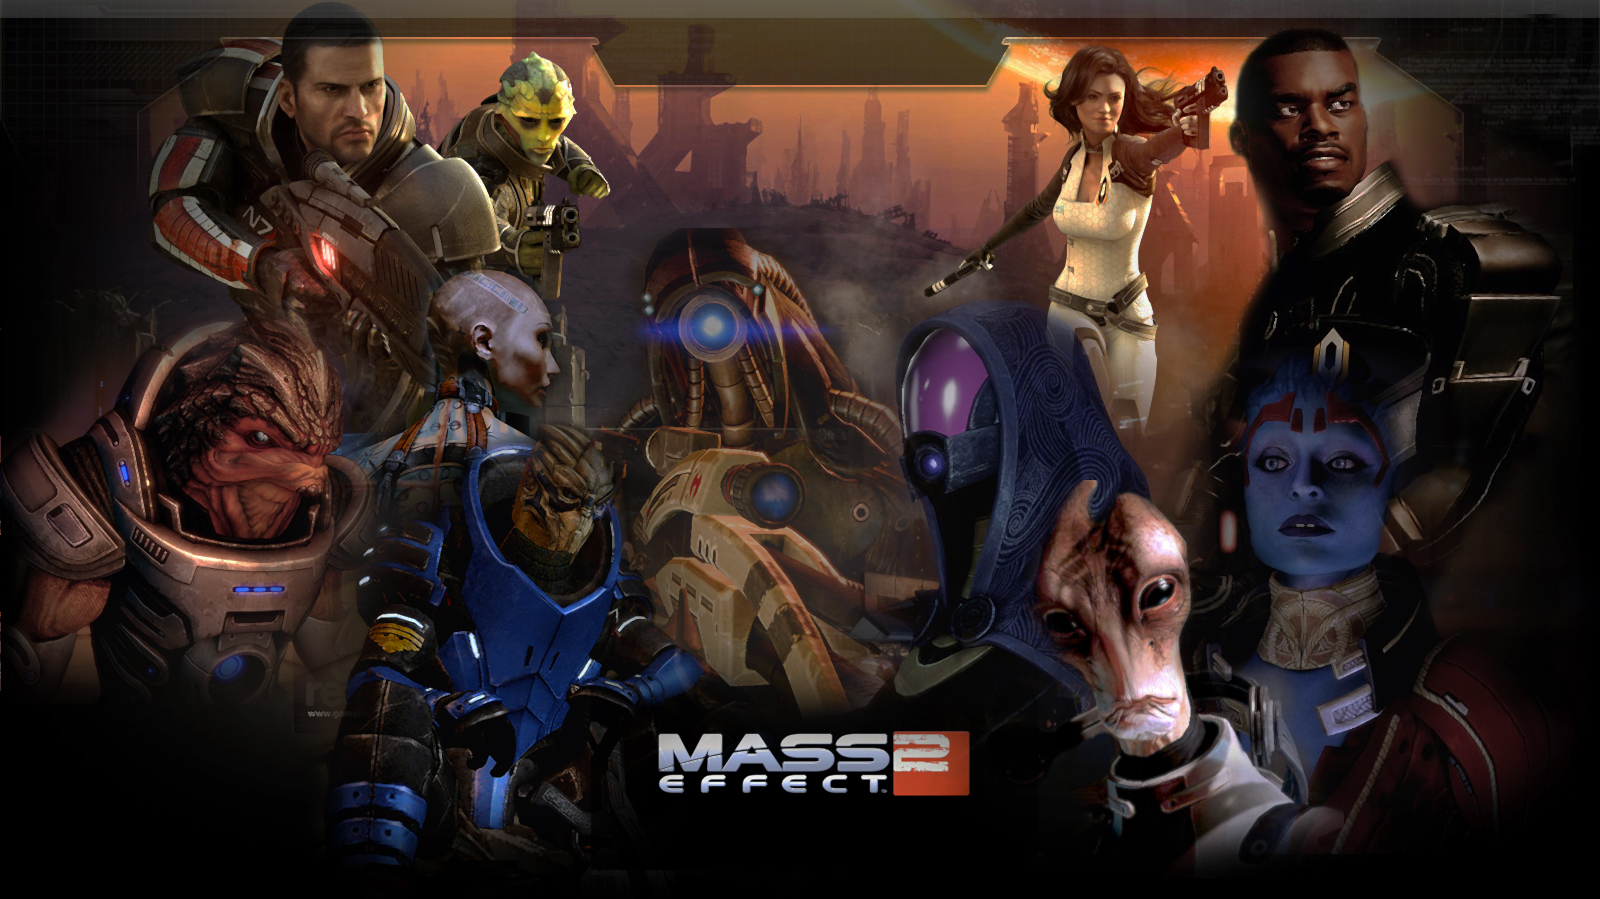 Best video game ever Mass_Effect_2_Wallpaper_by_zeebow14